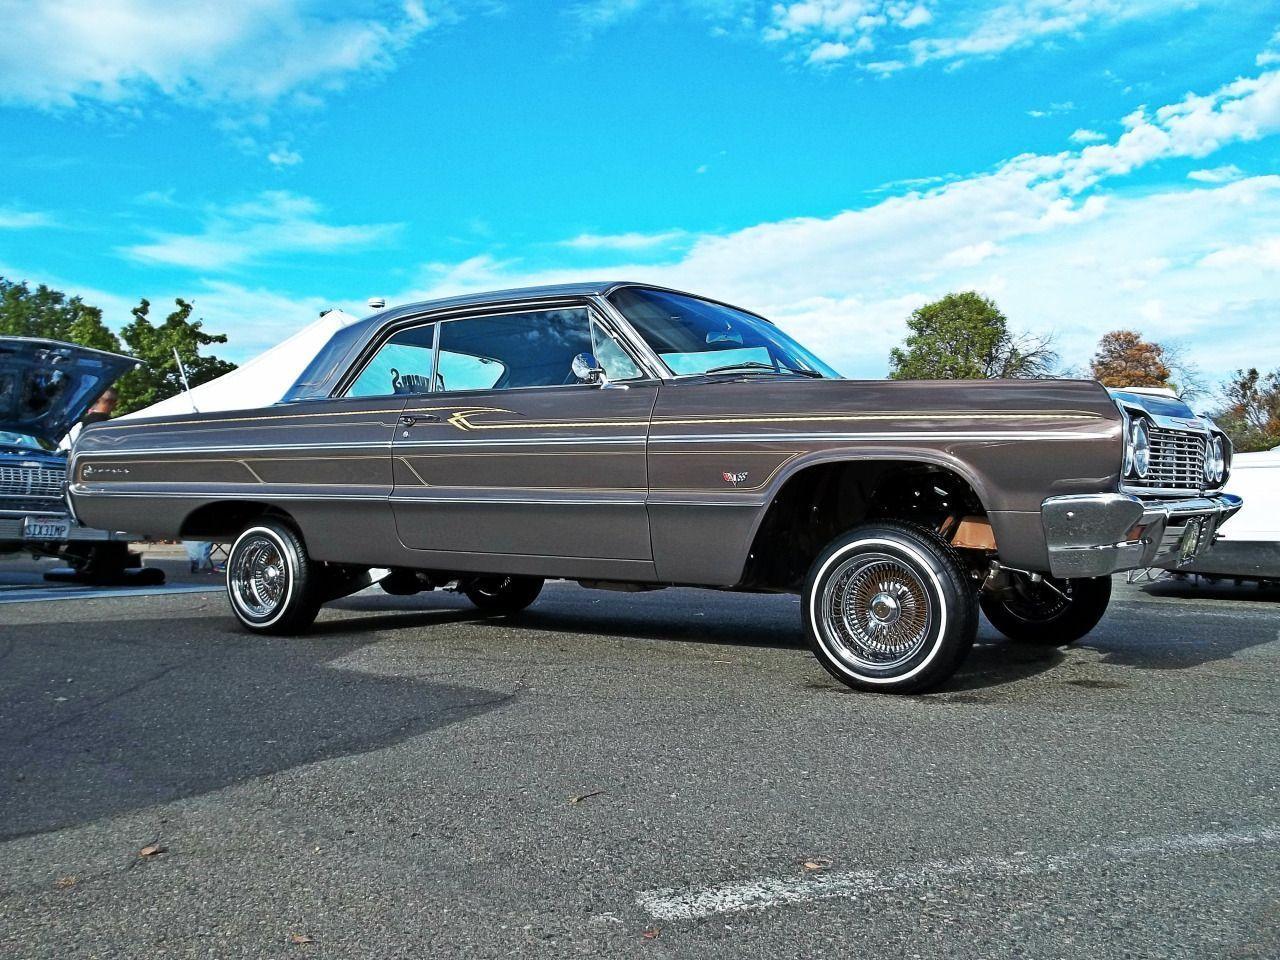 classic chevrolet impala cars and lowriders 1958 1962 impala 1963 rh pinterest com